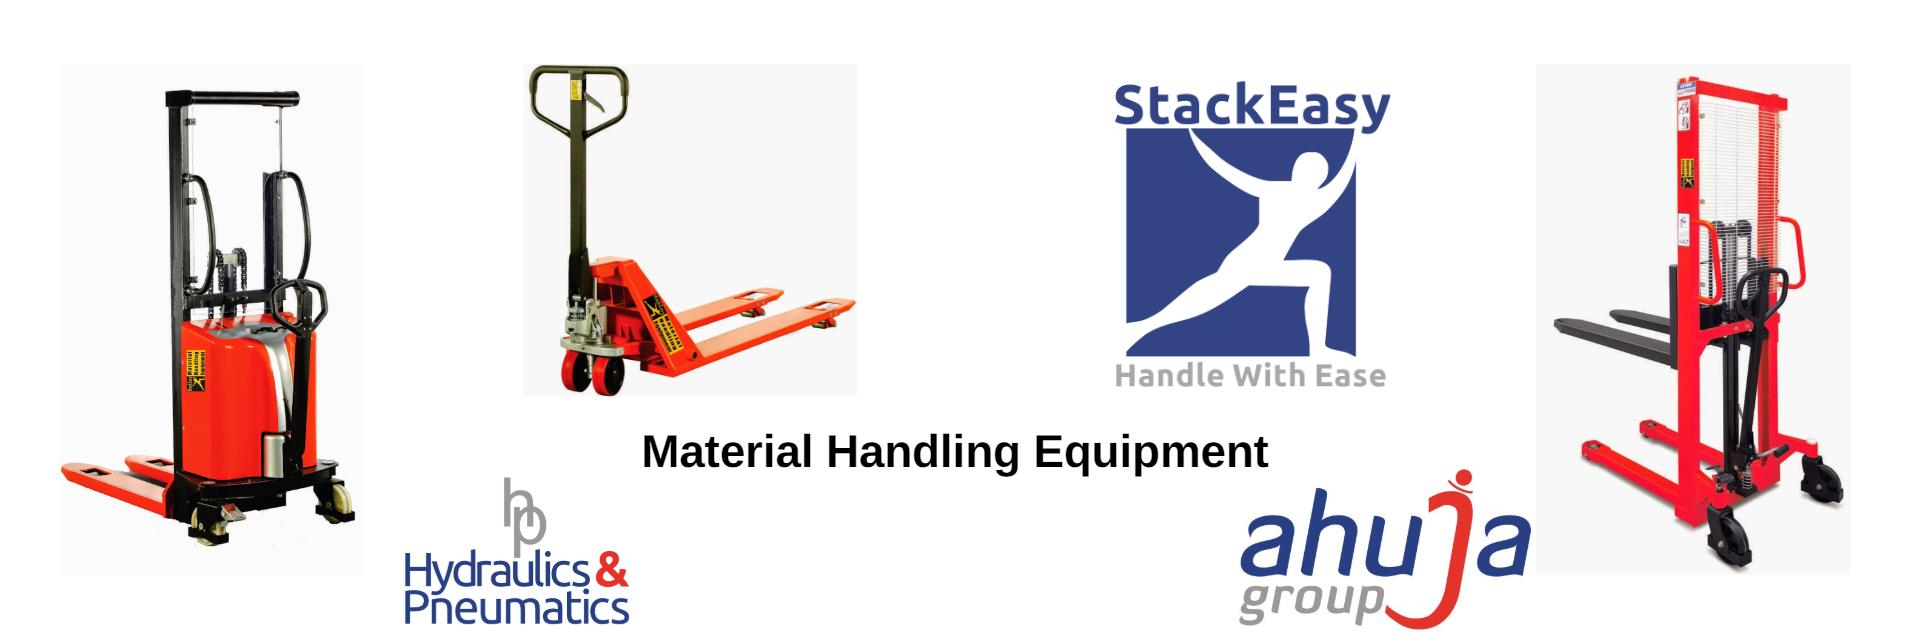 StackEasy Material Handling